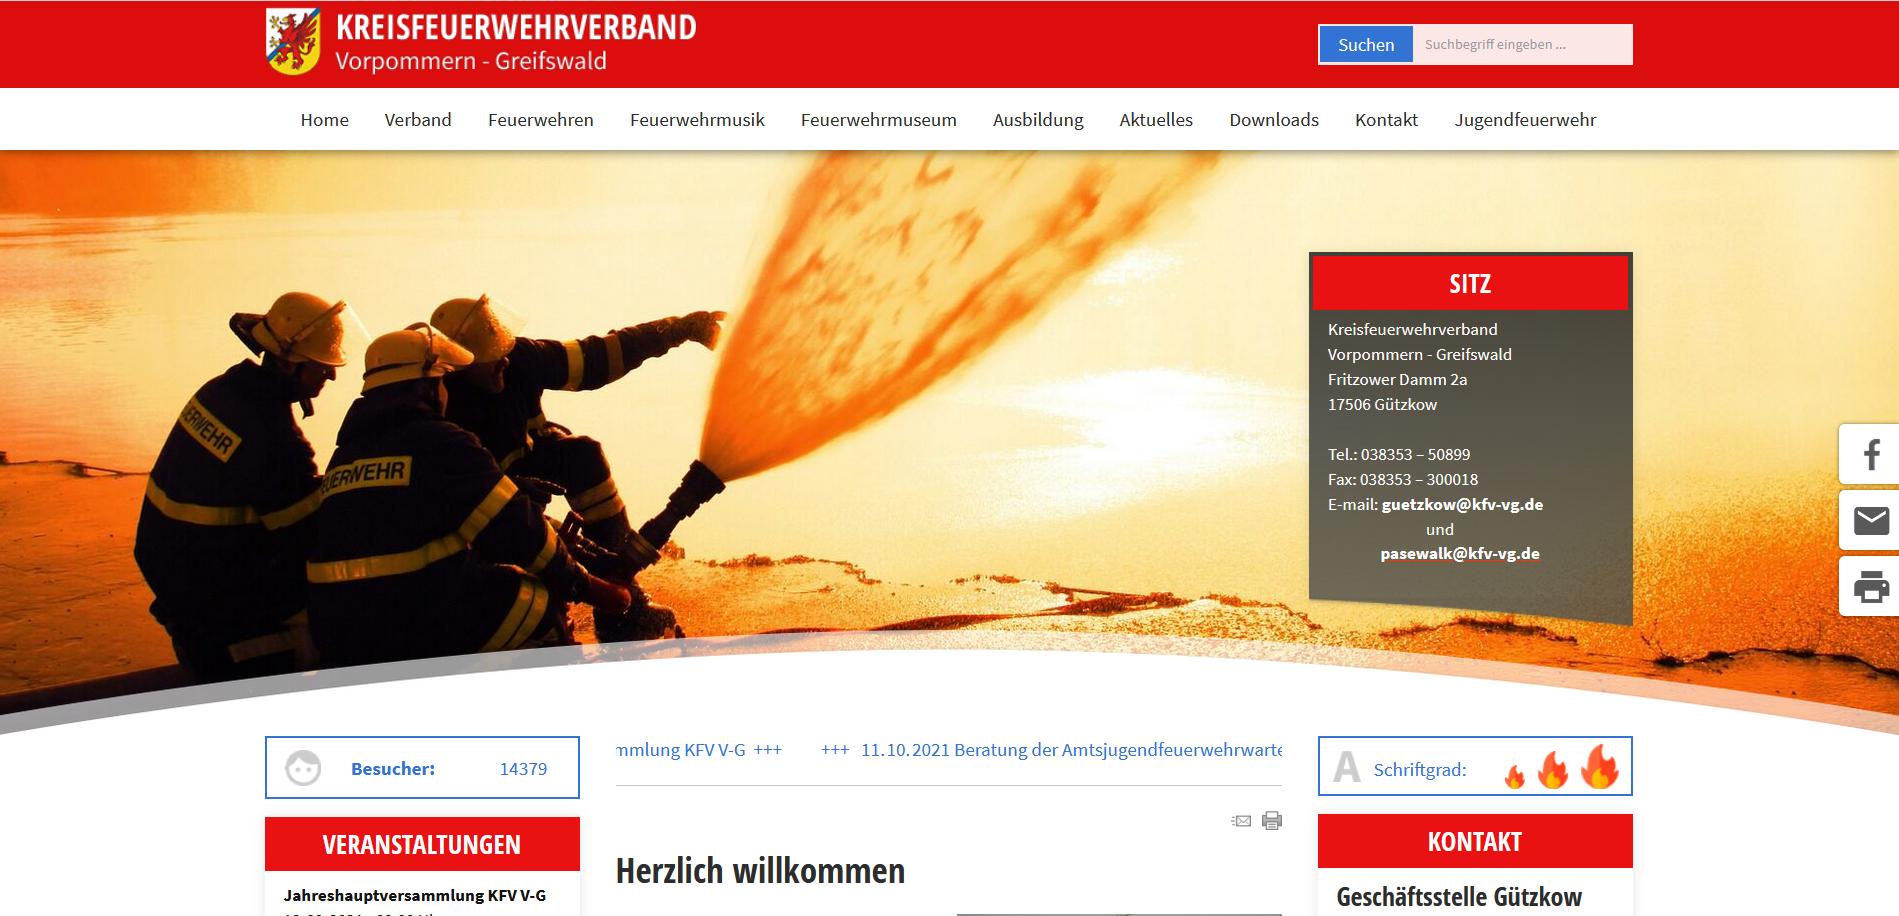 Kreisfeuerwehrverband Vorpommern Greifswald